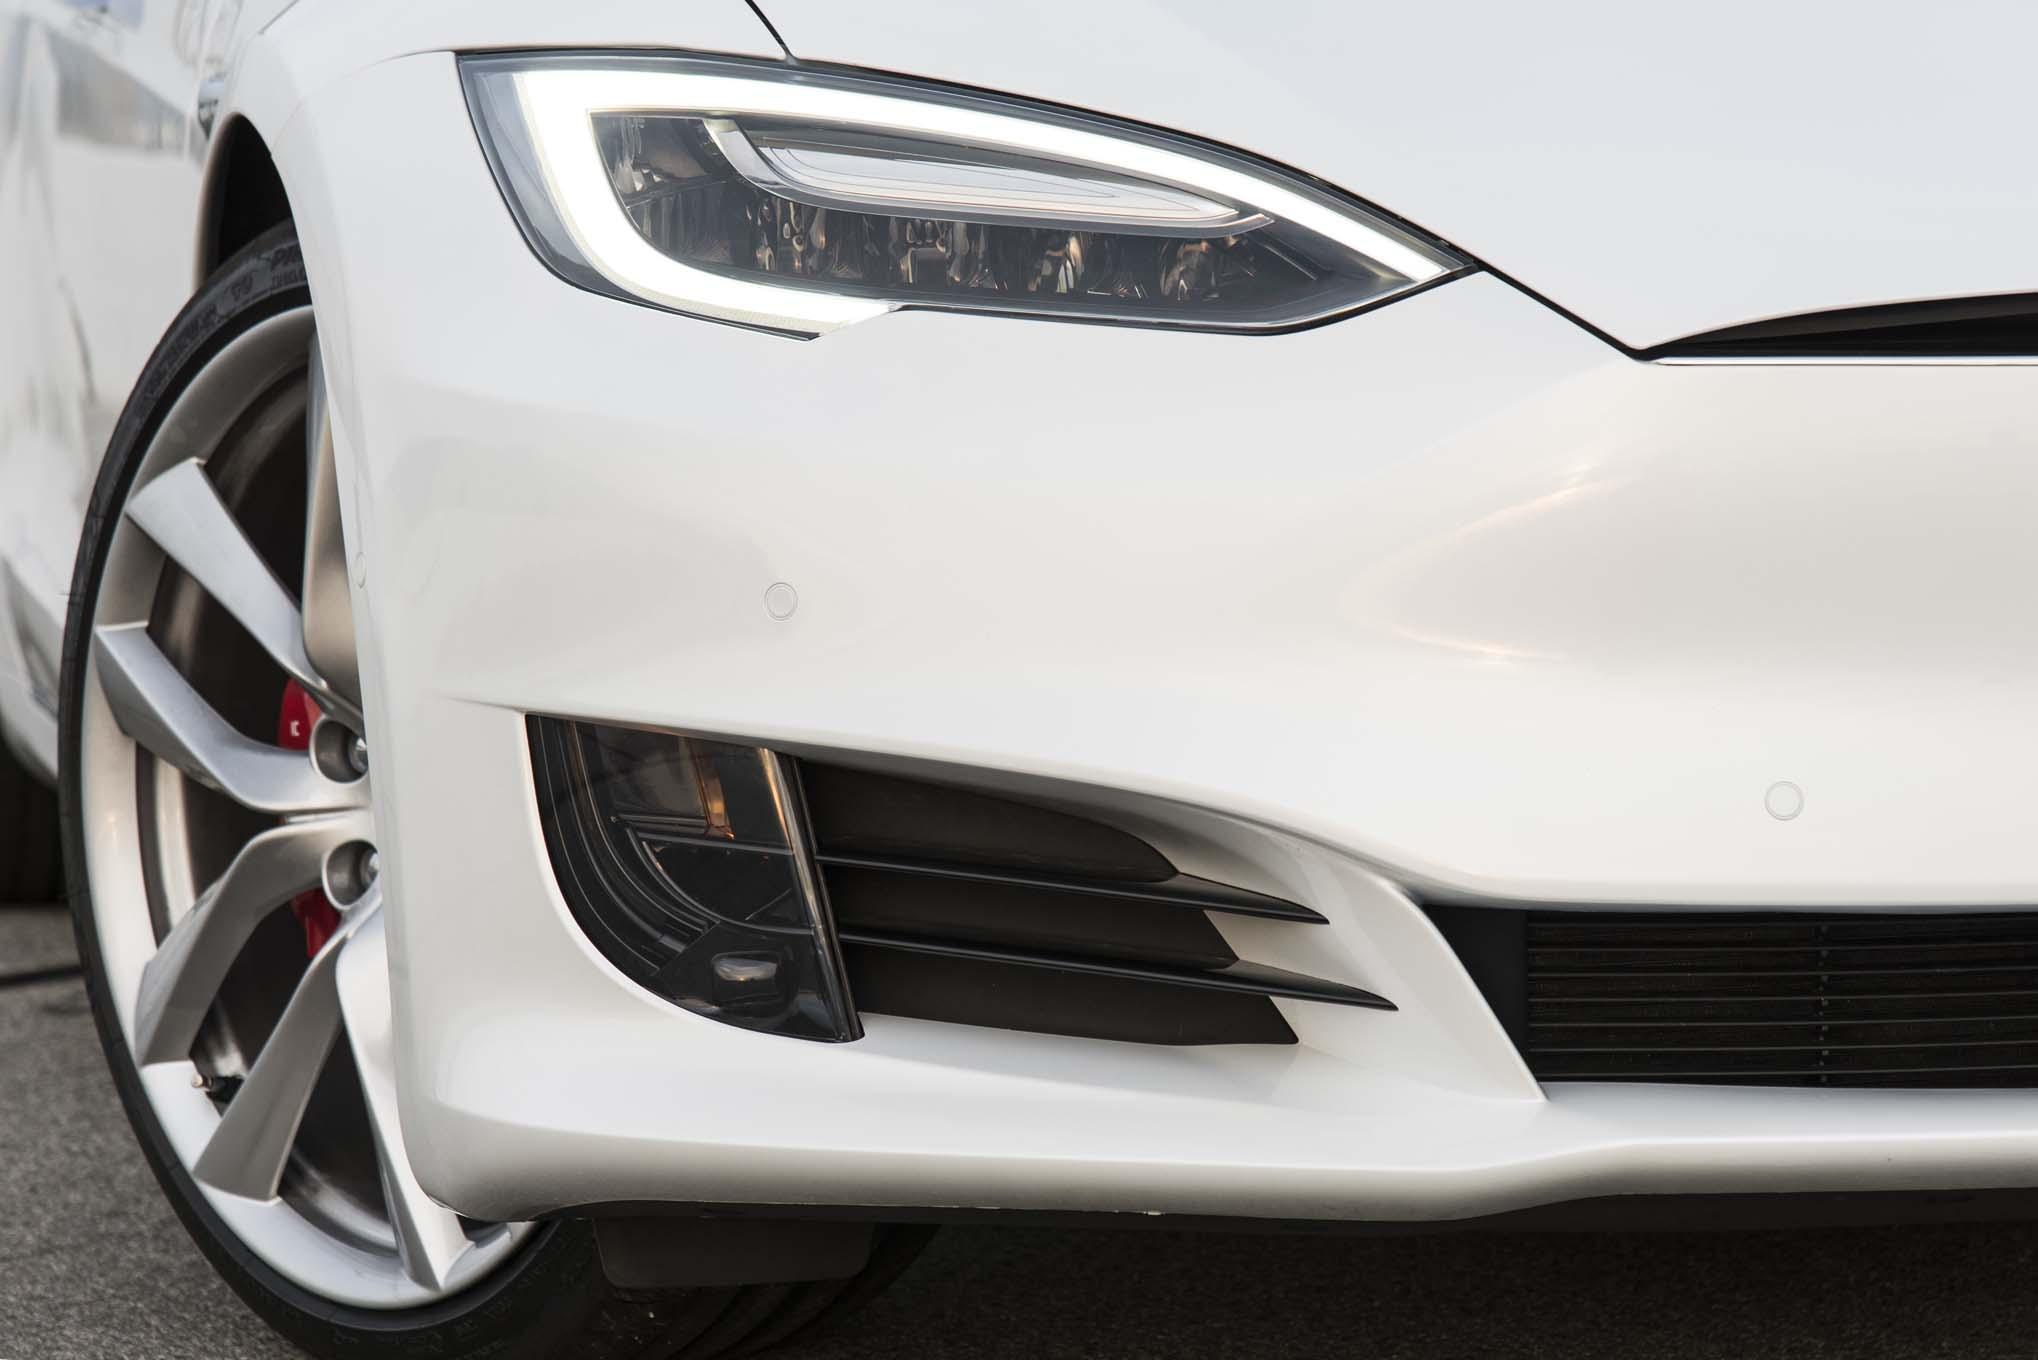 2017 Tesla Model S P100D. (Photo By, Brian Brantley/Brian Brantley Media, ©2017)